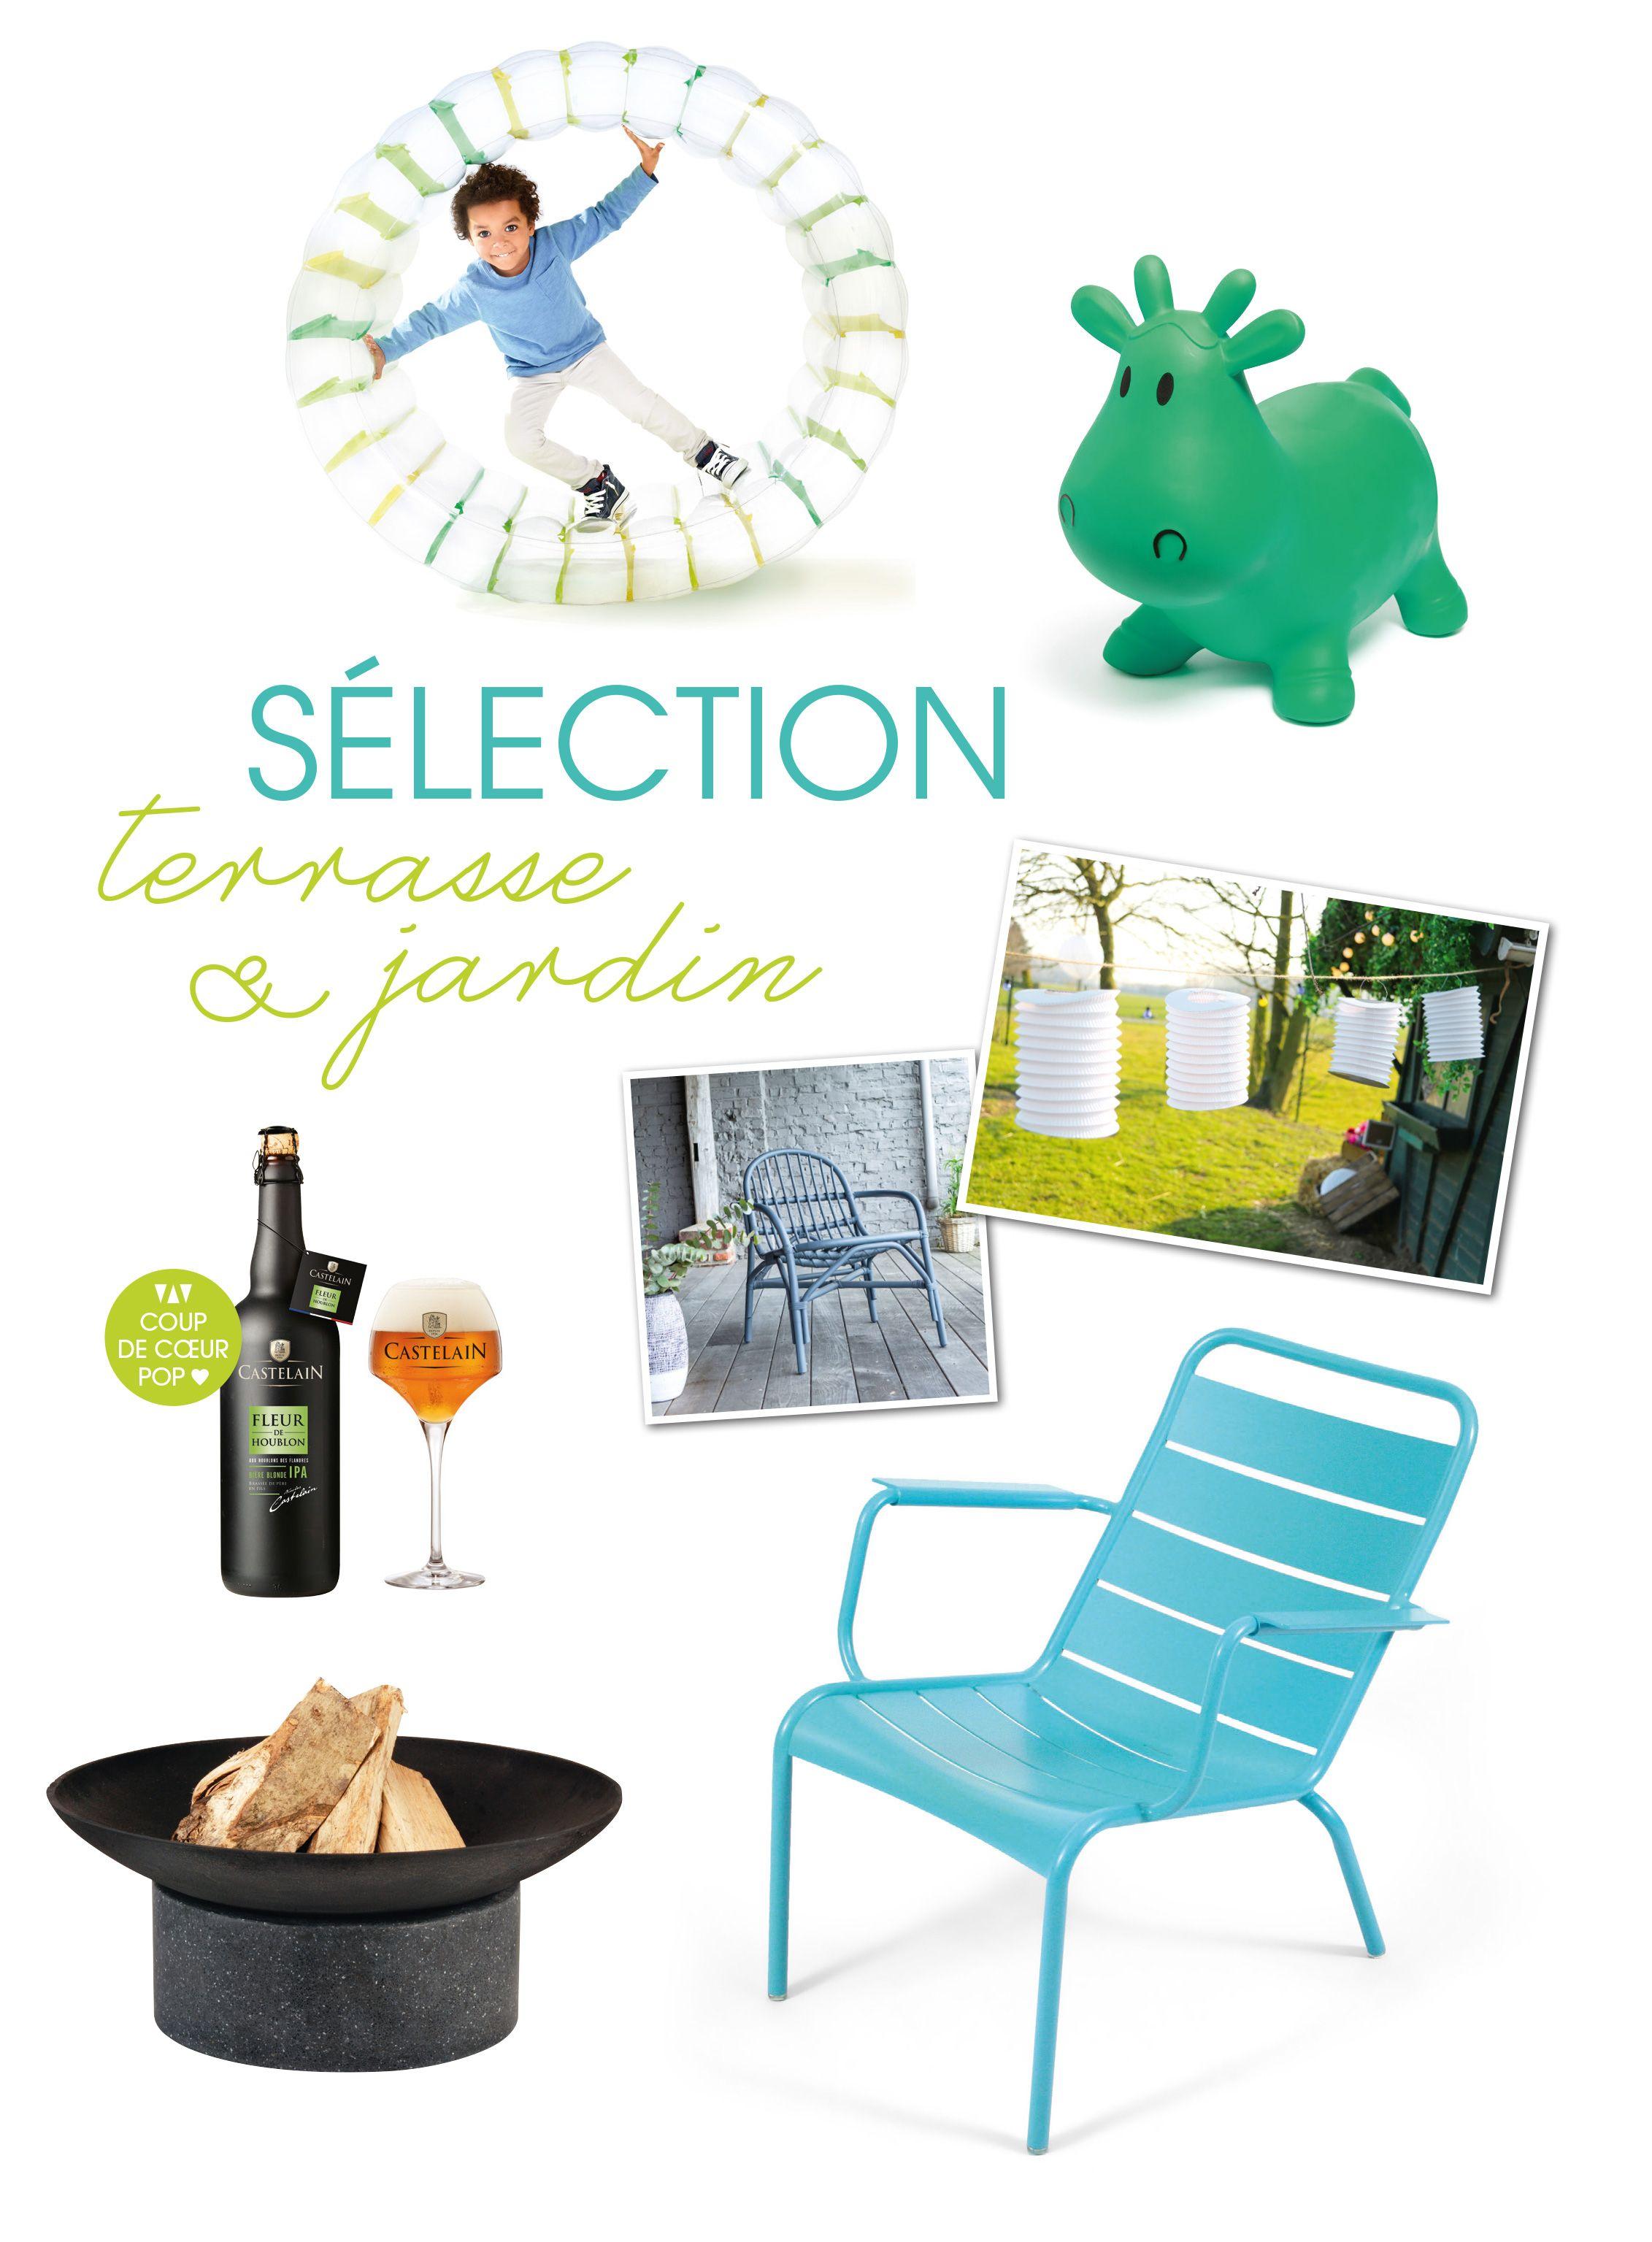 Notre Shopping Terrasse Et Jardin Pop Magazine 09 Juillet Aout 2016 Oxybul Tikamoon Brasserie Ch Ti Skylantern Esprit Terrasse Jardin Oxybul Terrasse